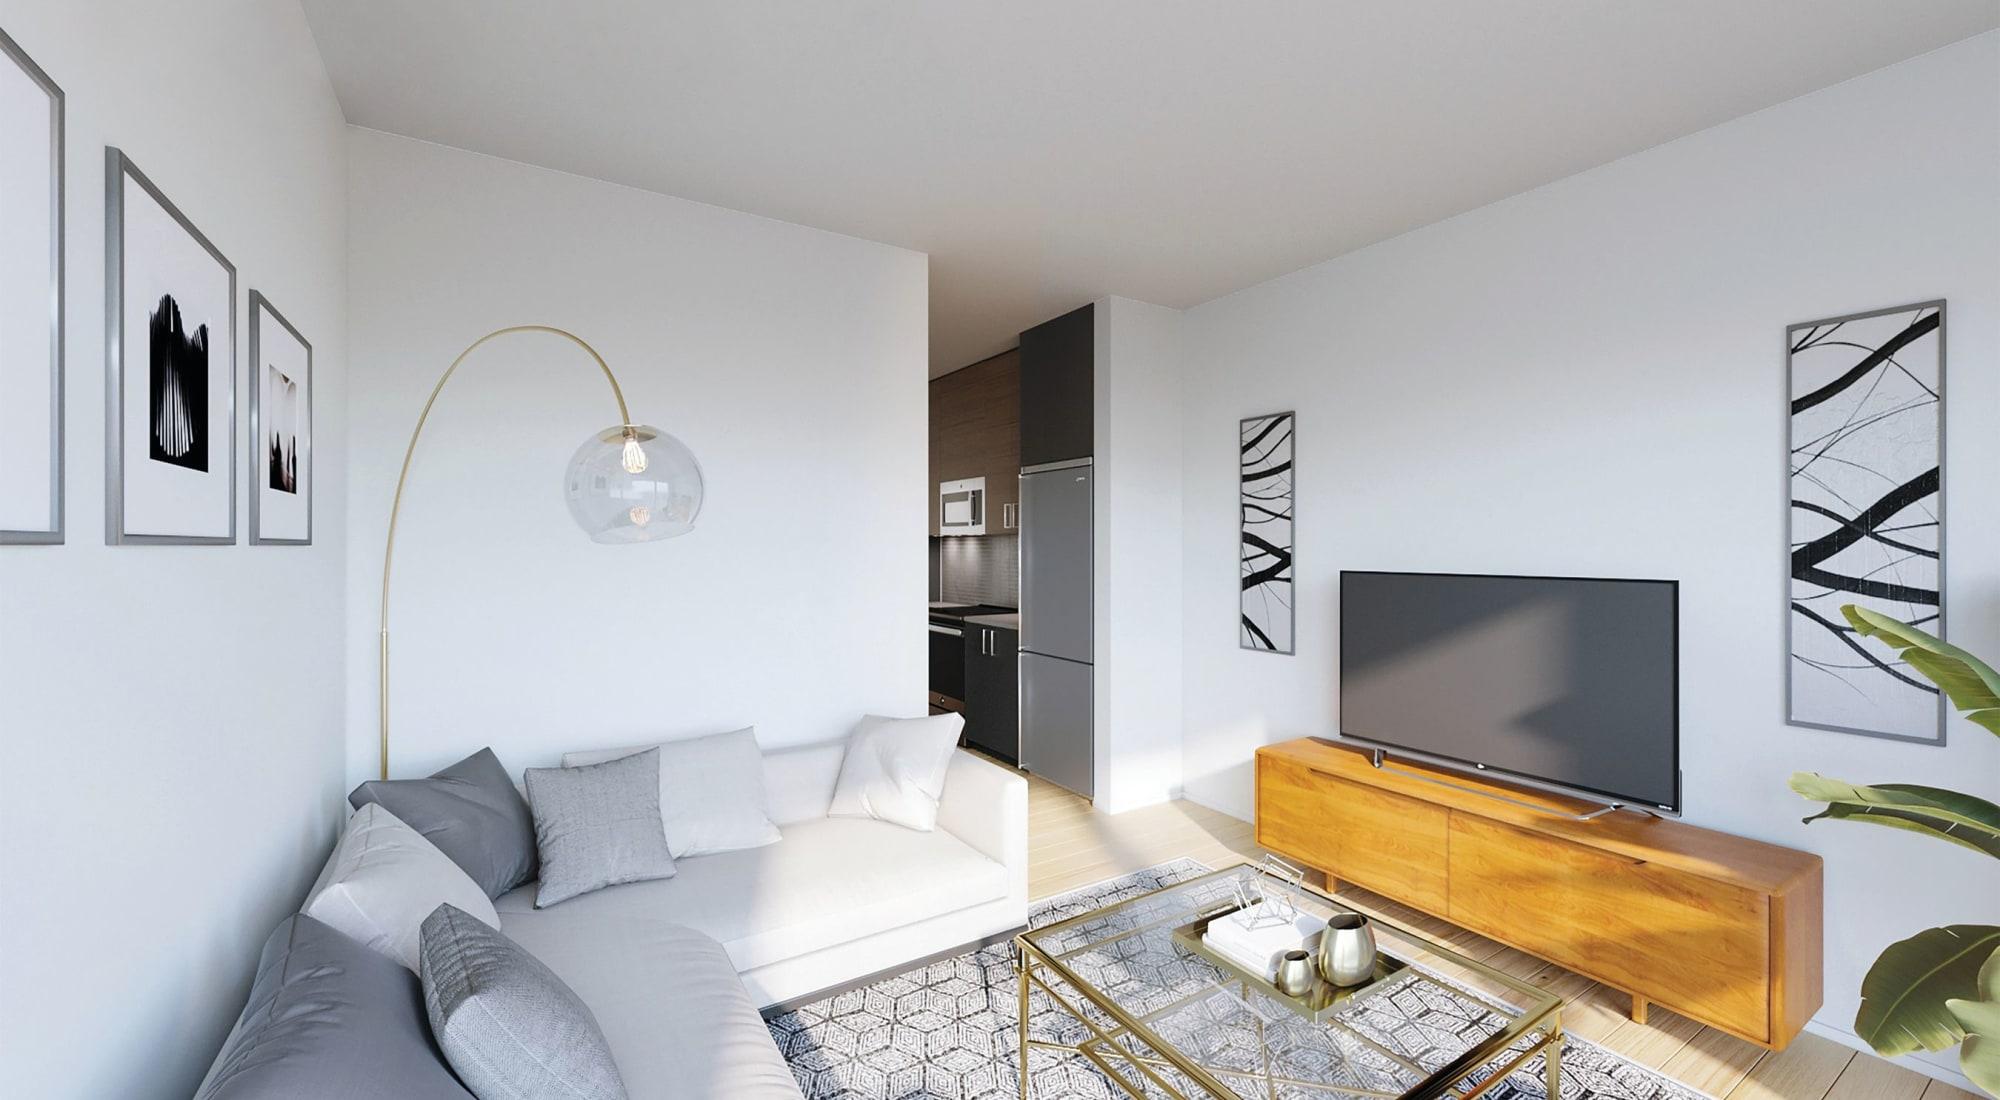 Living room at Blackbird in Redmond, WA